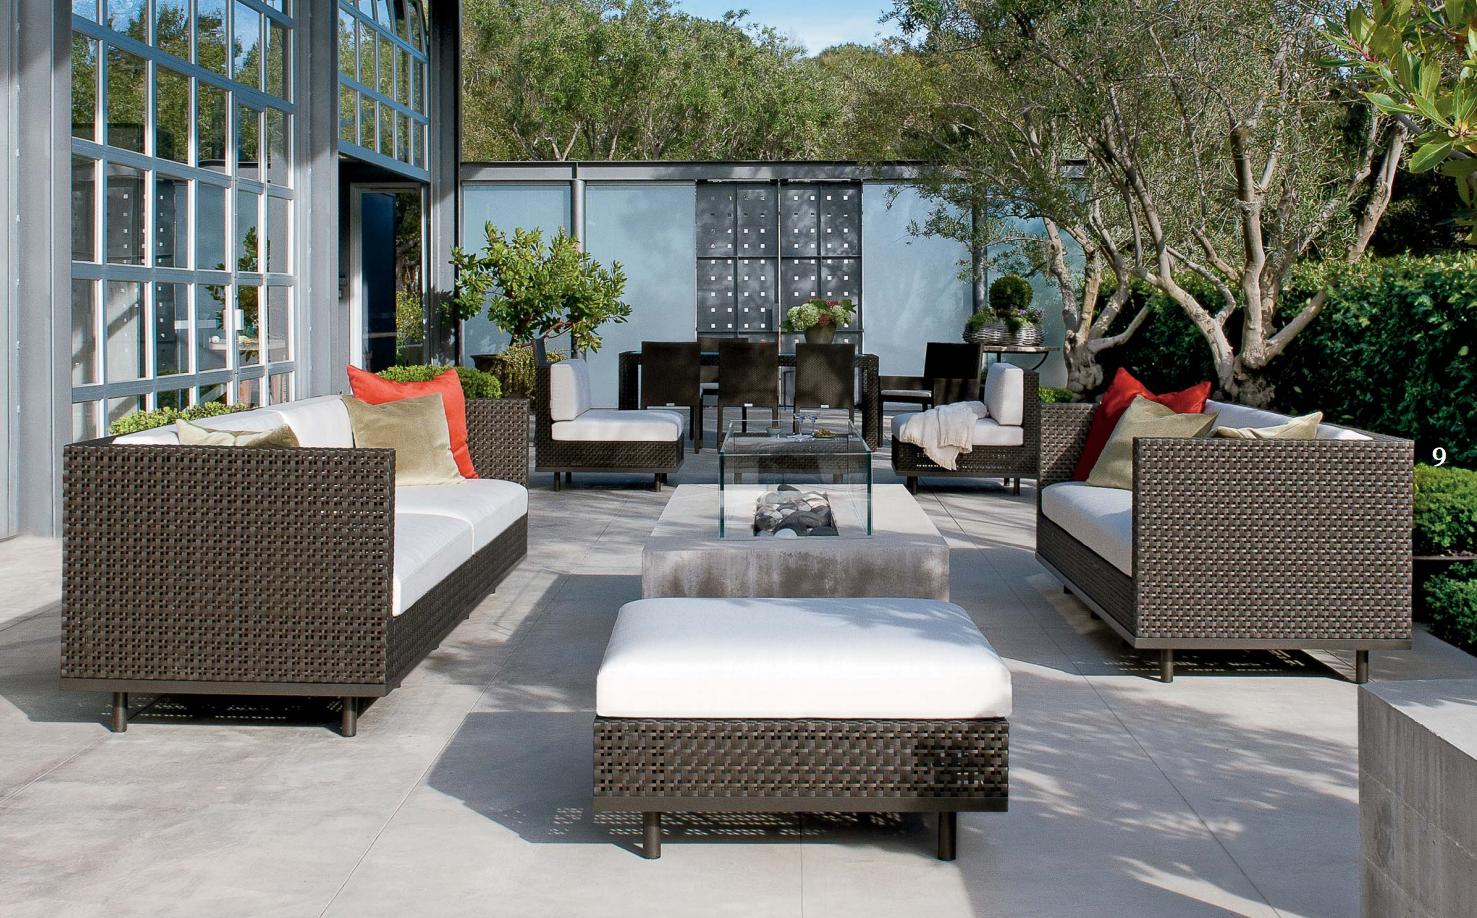 Outdoor Living Transform Your Garden Or Patio Into A with regard to dimensions 1477 X 918